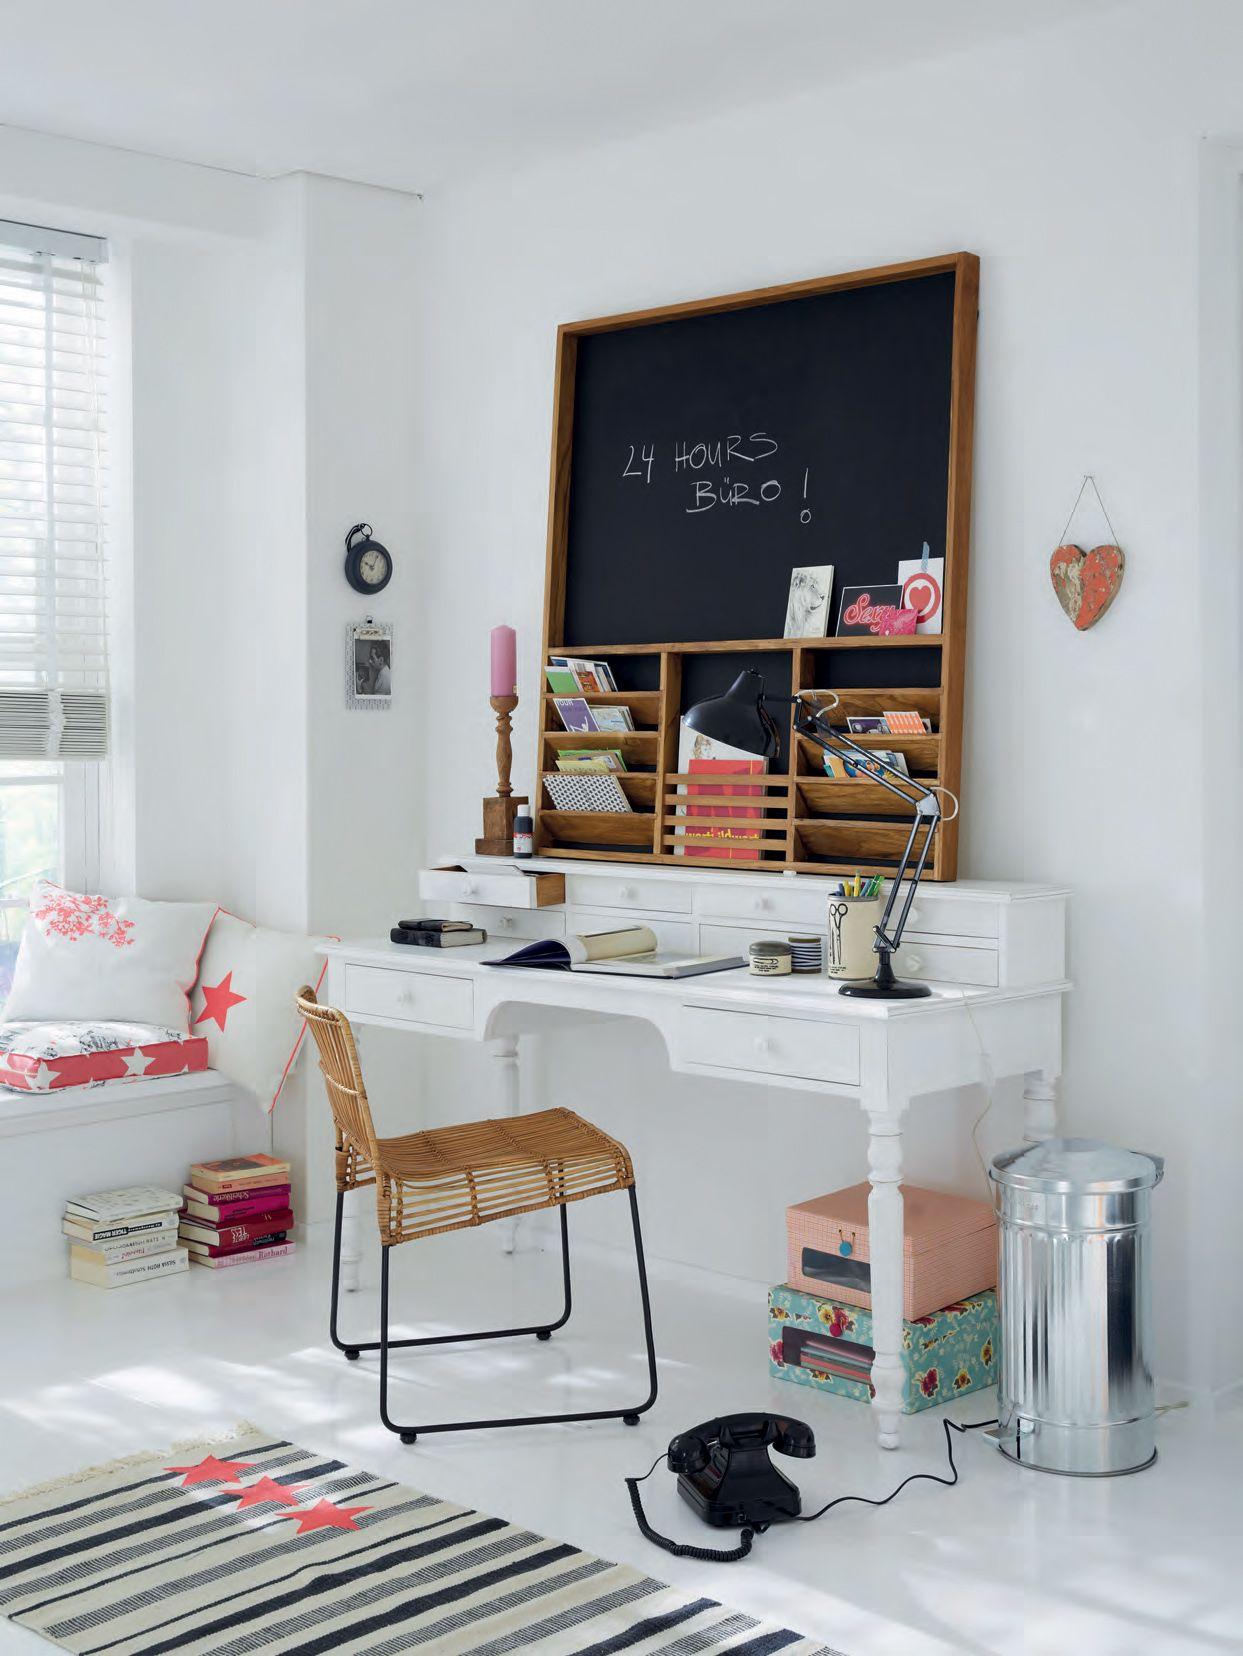 Новая порция домашней красоты от Car Moebel | Office spaces, Spaces ...